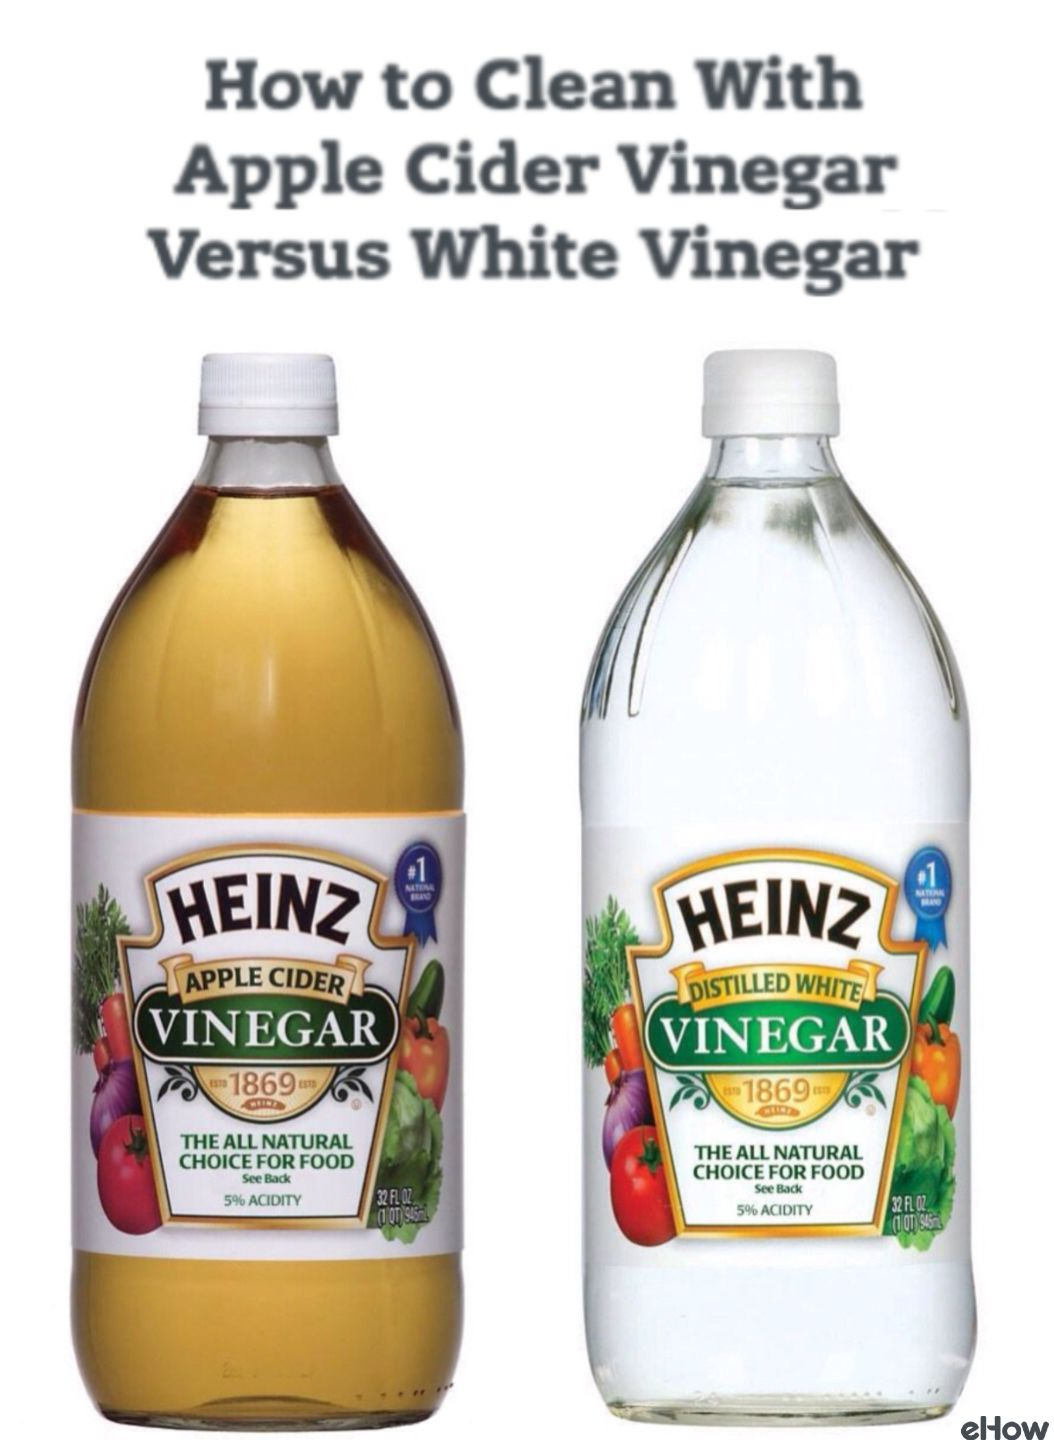 Natural Healing Remedies Using Apple Cider Vinegar Cider Vinegar Benefits Apple Cider Vinegar Remedies Apple Cider Vinegar Uses